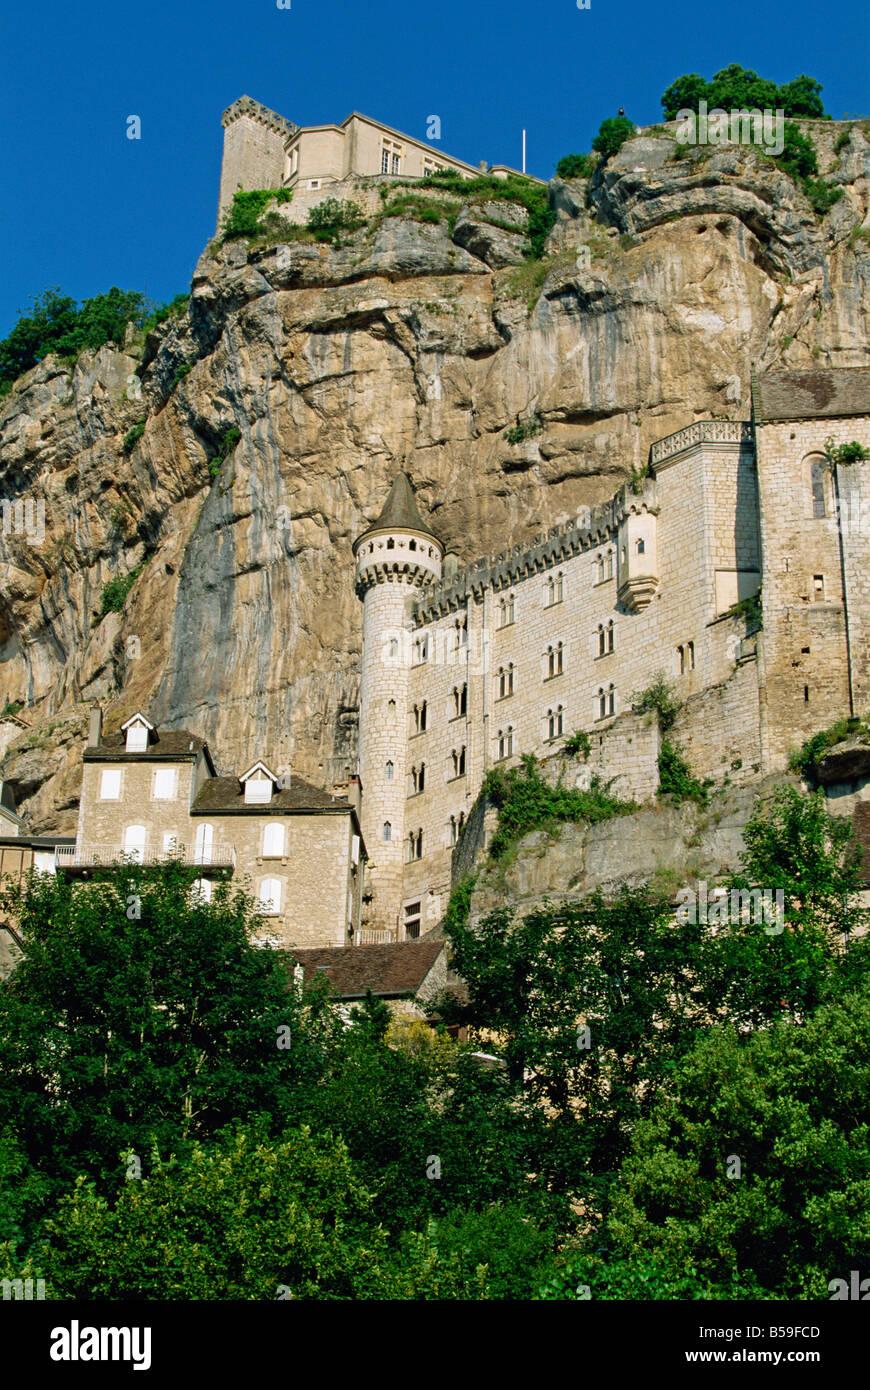 Rocamadour, legendären mittelalterlichen Dorf, das klammert sich an den Klippen des Alzou Tal, Lot, Frankreich, Stockbild